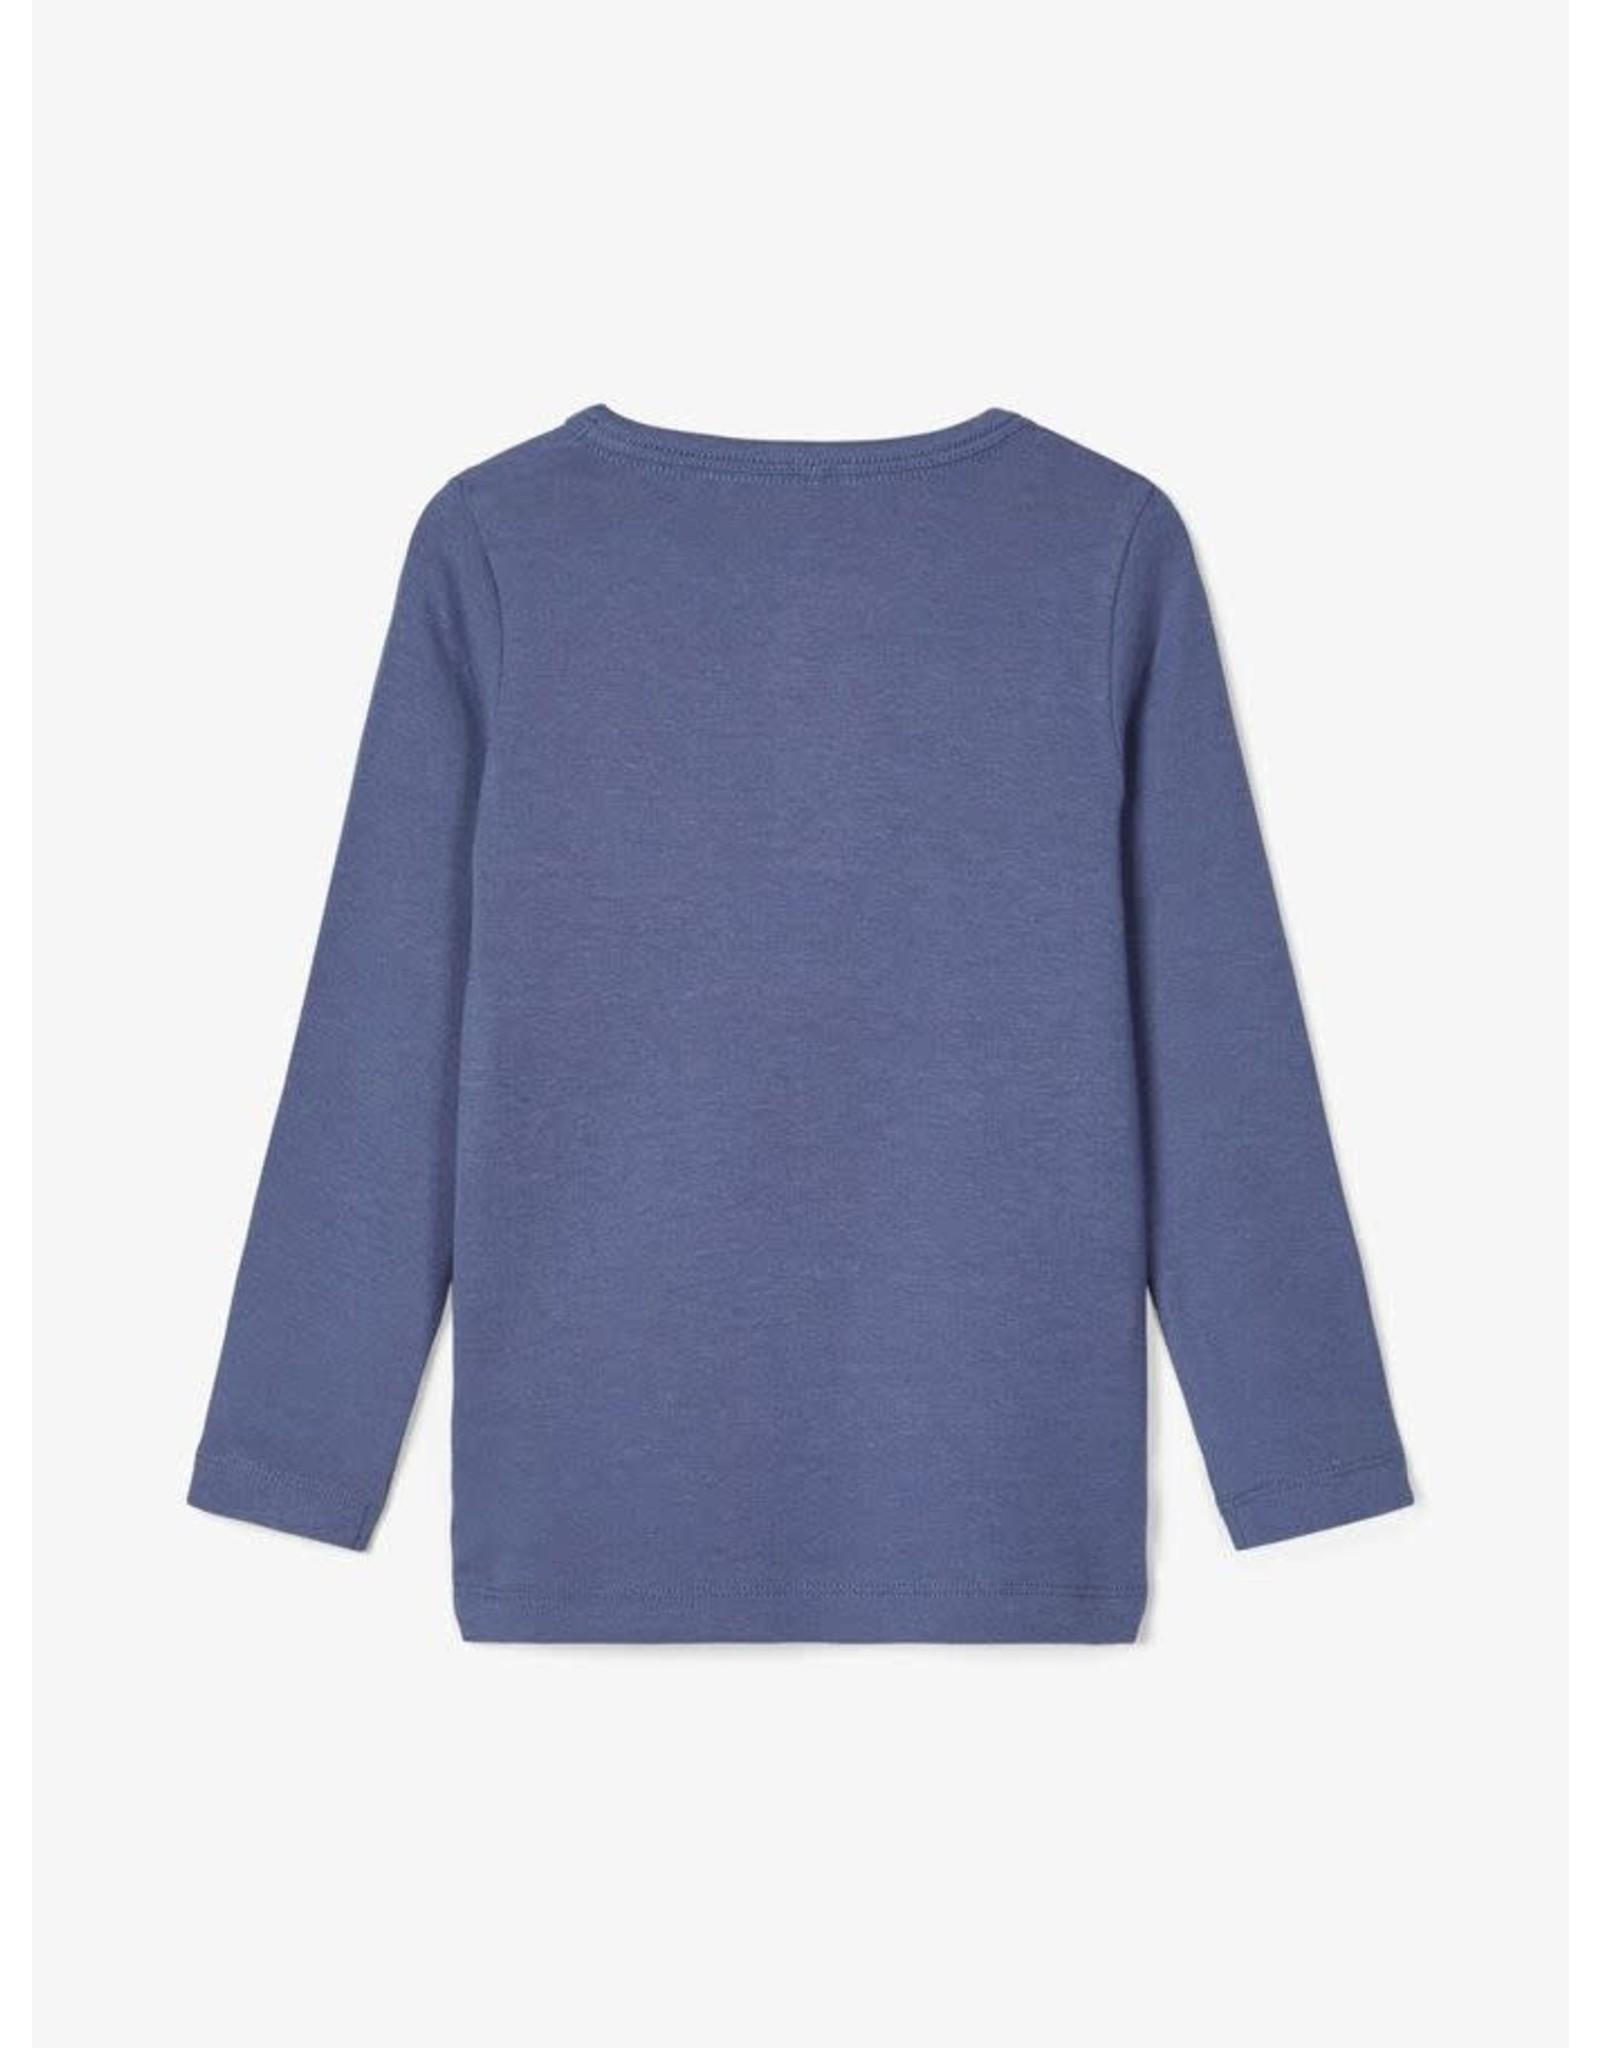 Name It Mooie zacht blauwe slim fit t-shirt uit bio katoen